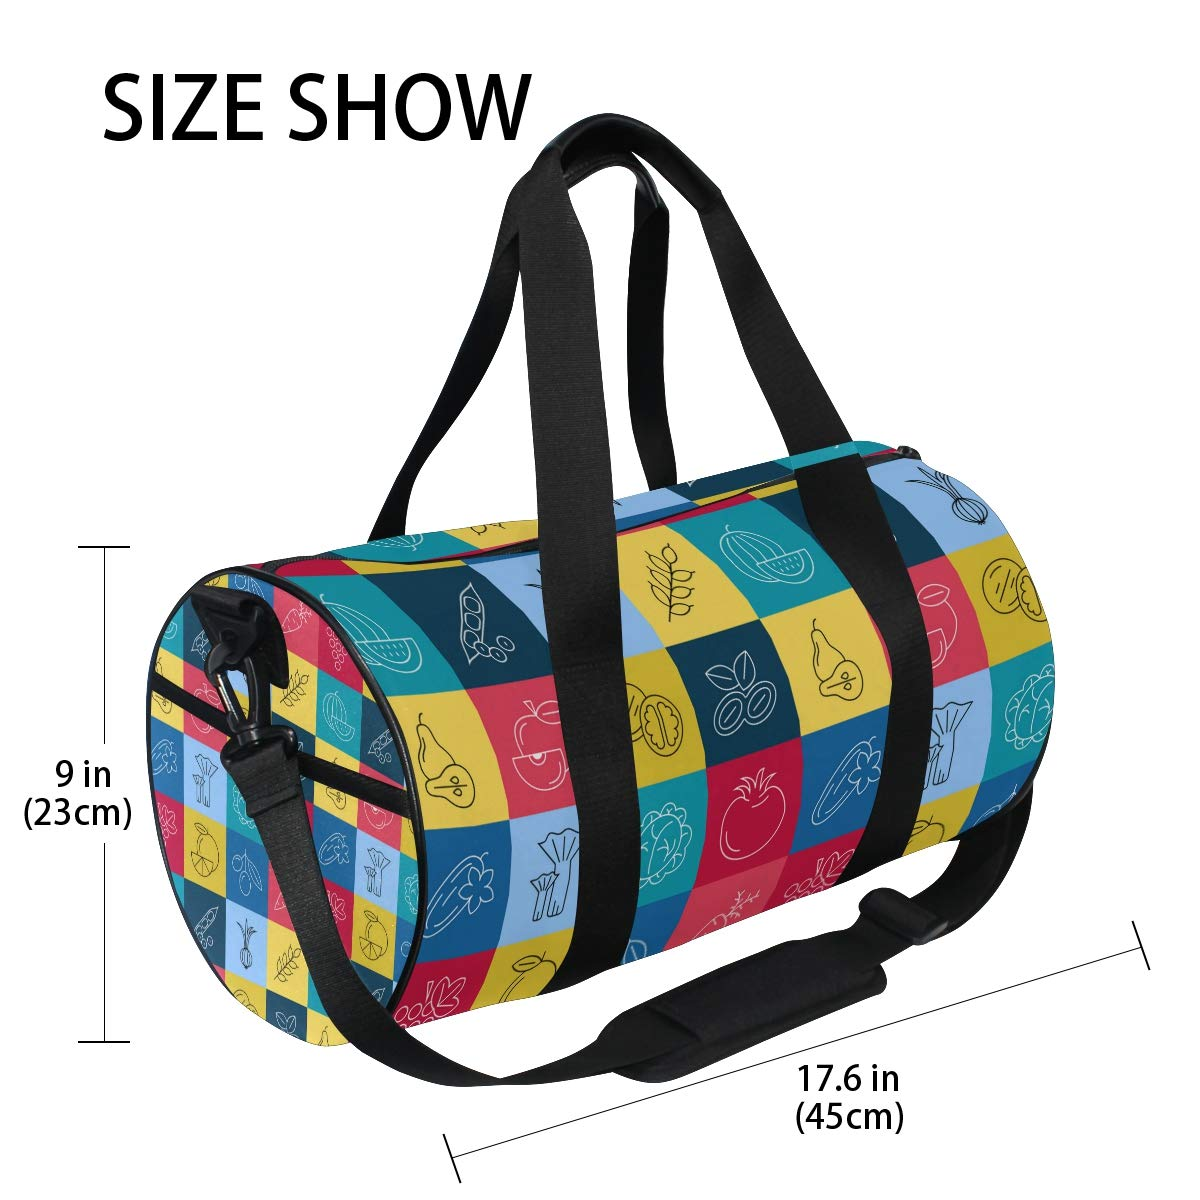 Waterproof Non-Slip Wearable Crossbody Bag fitness bag Shoulder Bag Vegetable Cuber Picture